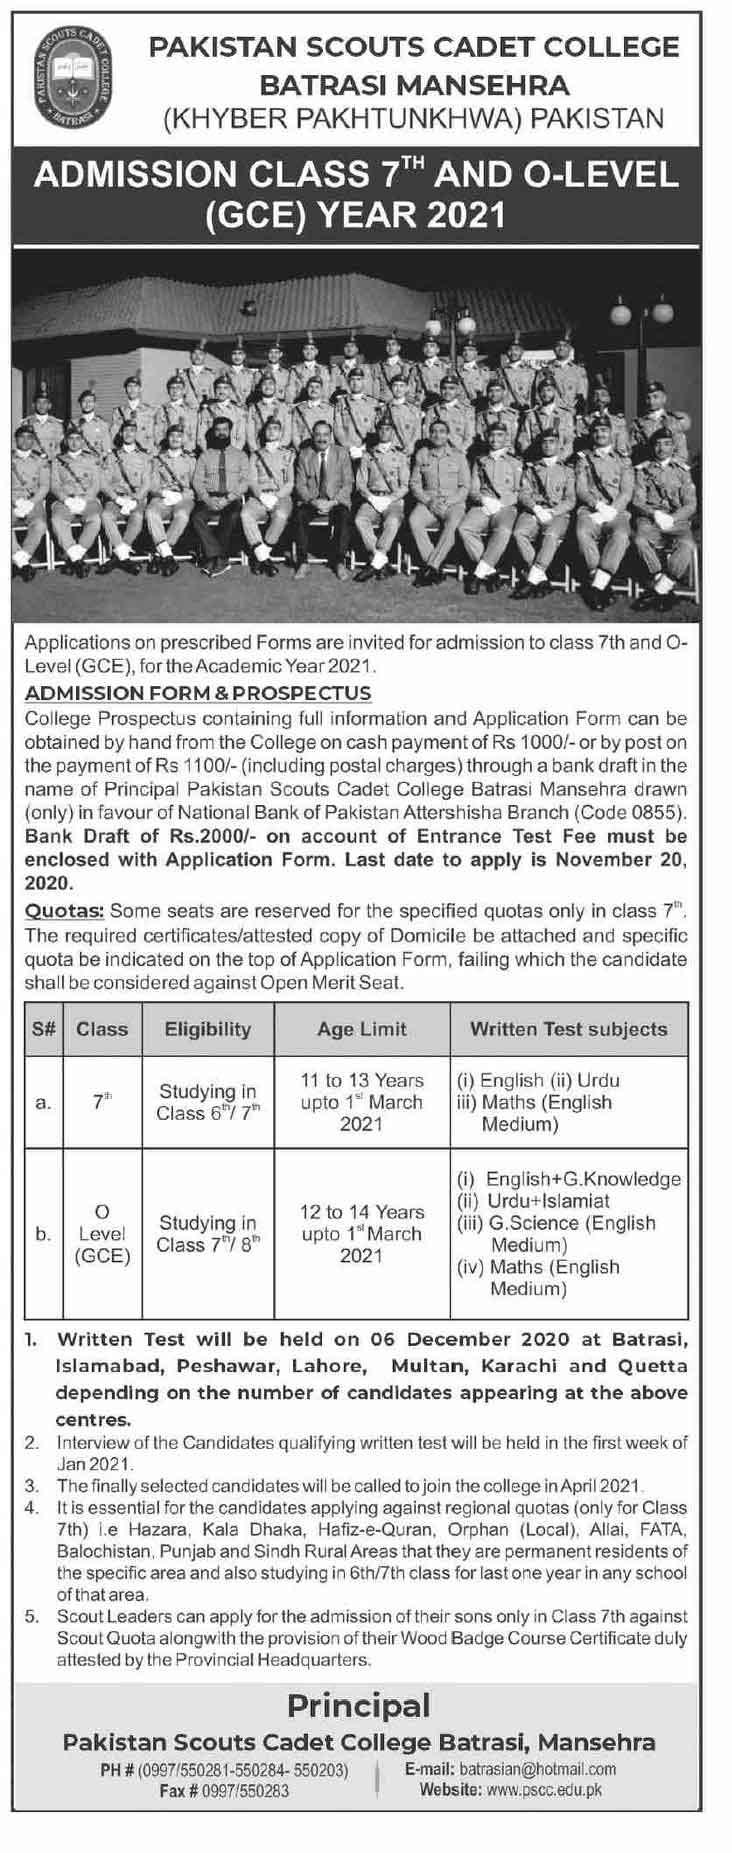 Pakistan-Scouts-Cadet-College-Batrasi-Admission-2021